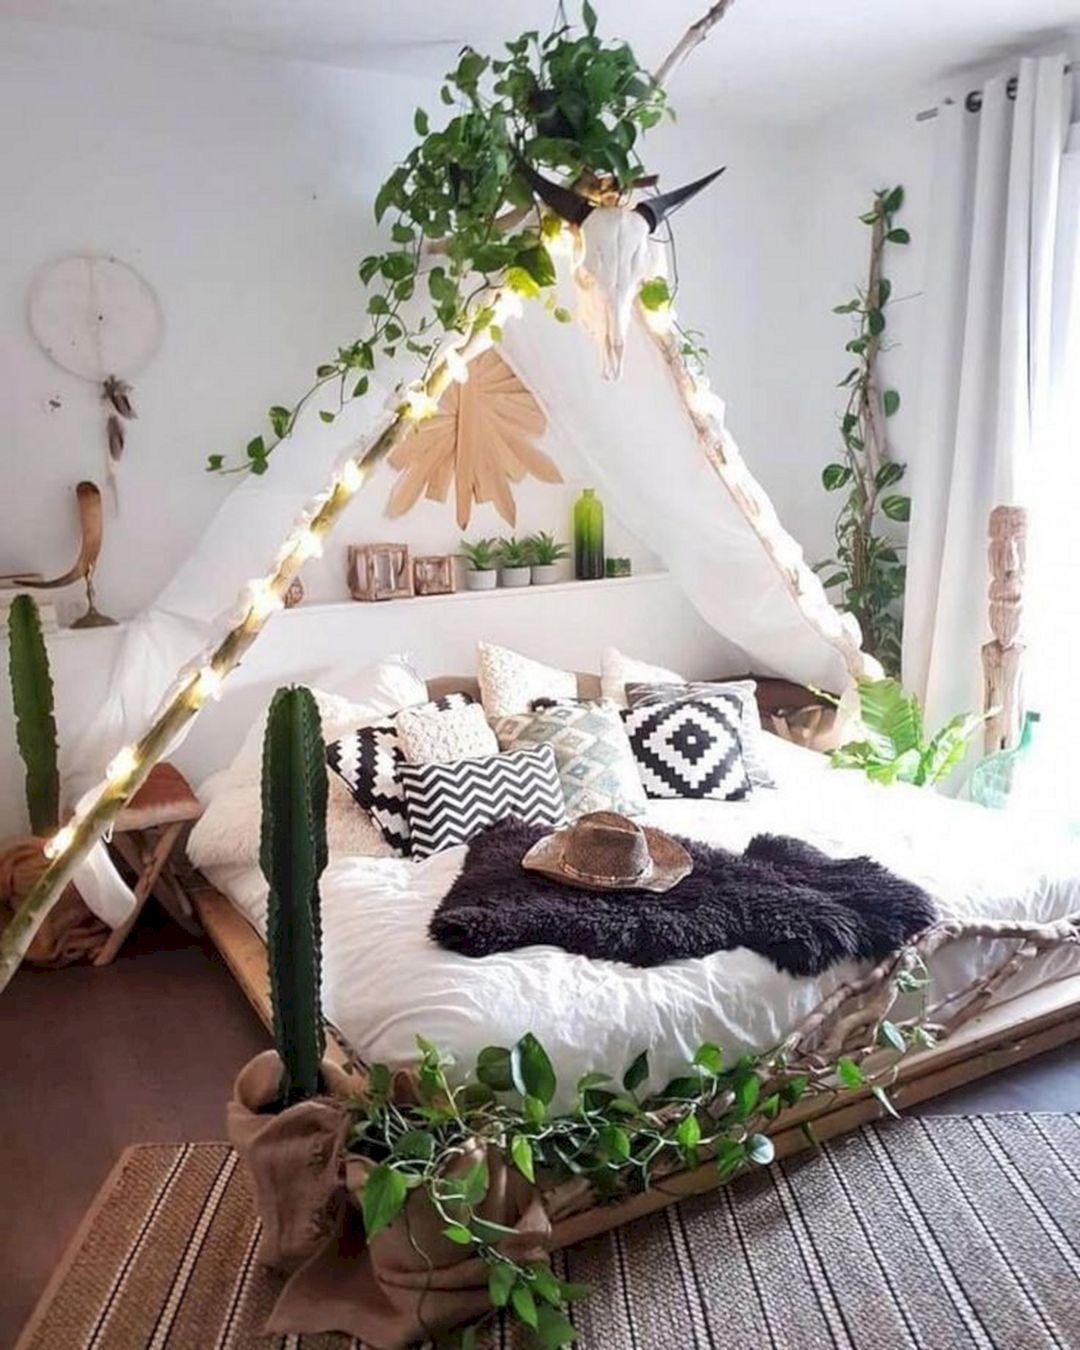 20 Wonderful Bohemian Minimalist Bedroom Ideas You Have To See Bohemian Bedroom Design Boho Bedroom Decor Bedroom Makeover Minimalist boho bedroom ideas